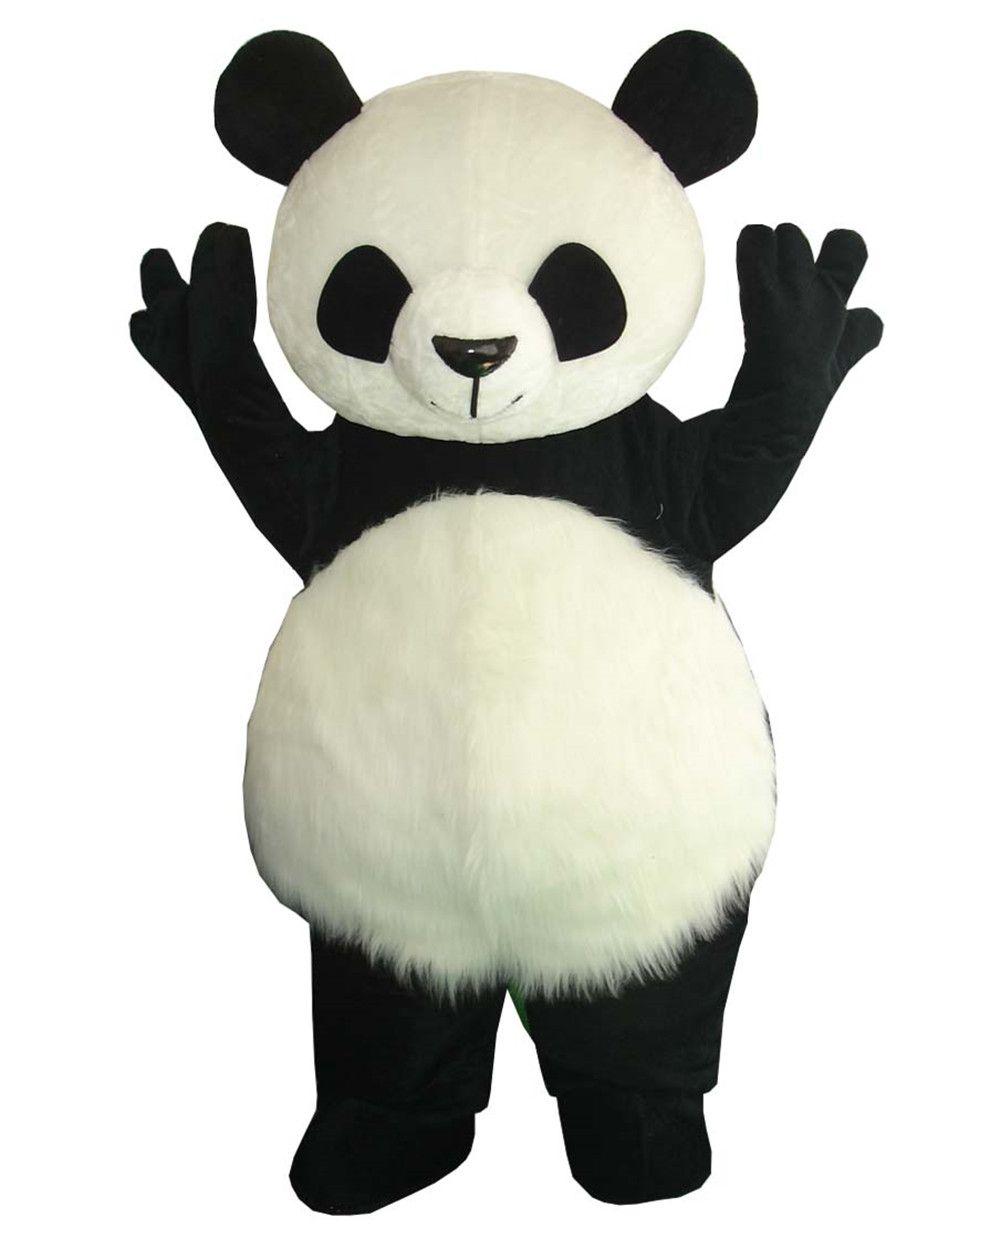 Wholesale New Version Chinese Giant Panda Mascot Costume Christmas cosplay Mascot Costume Free Shipping